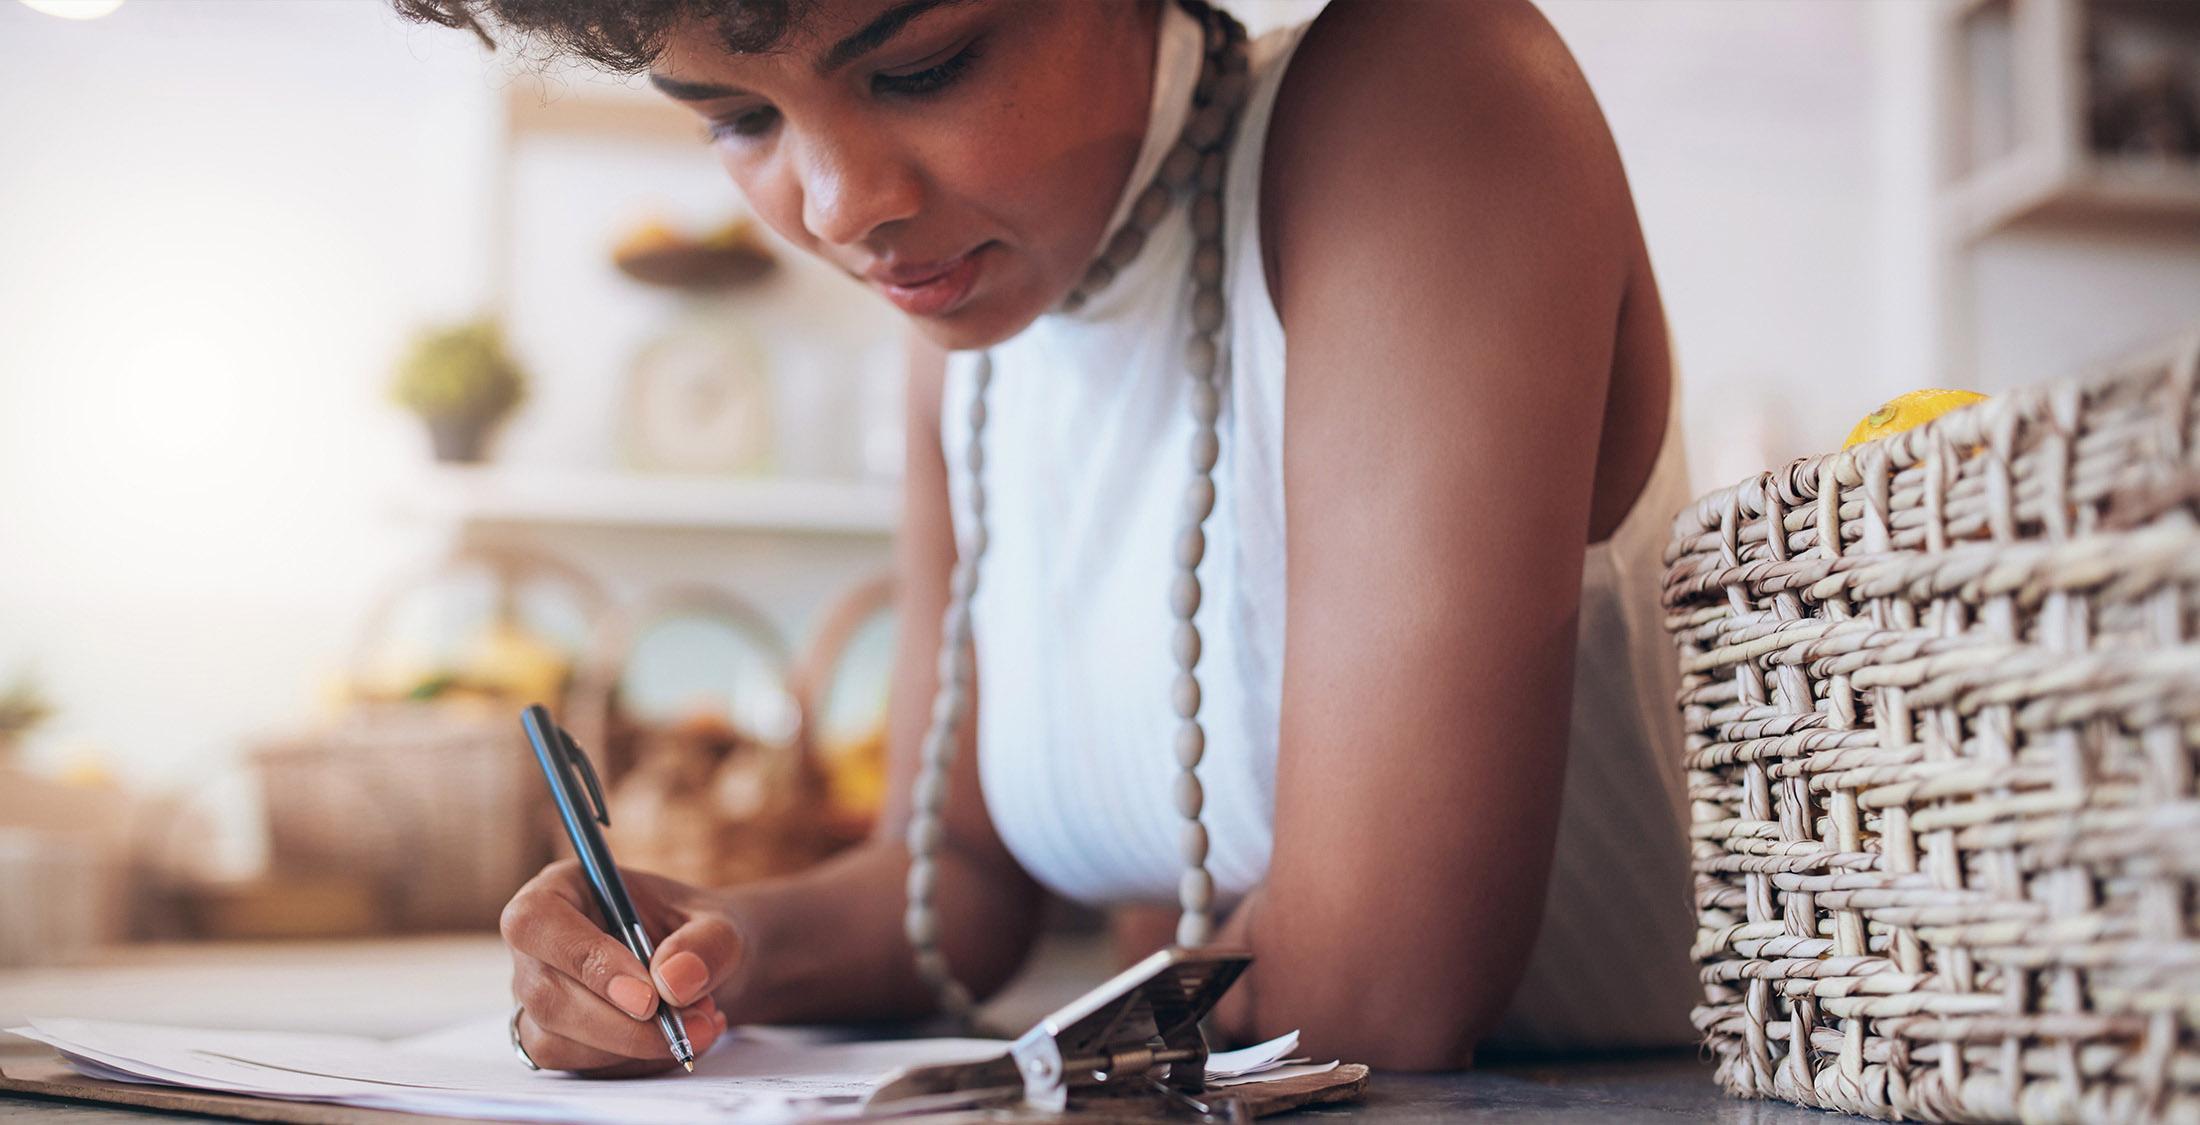 woman writing on clipboard